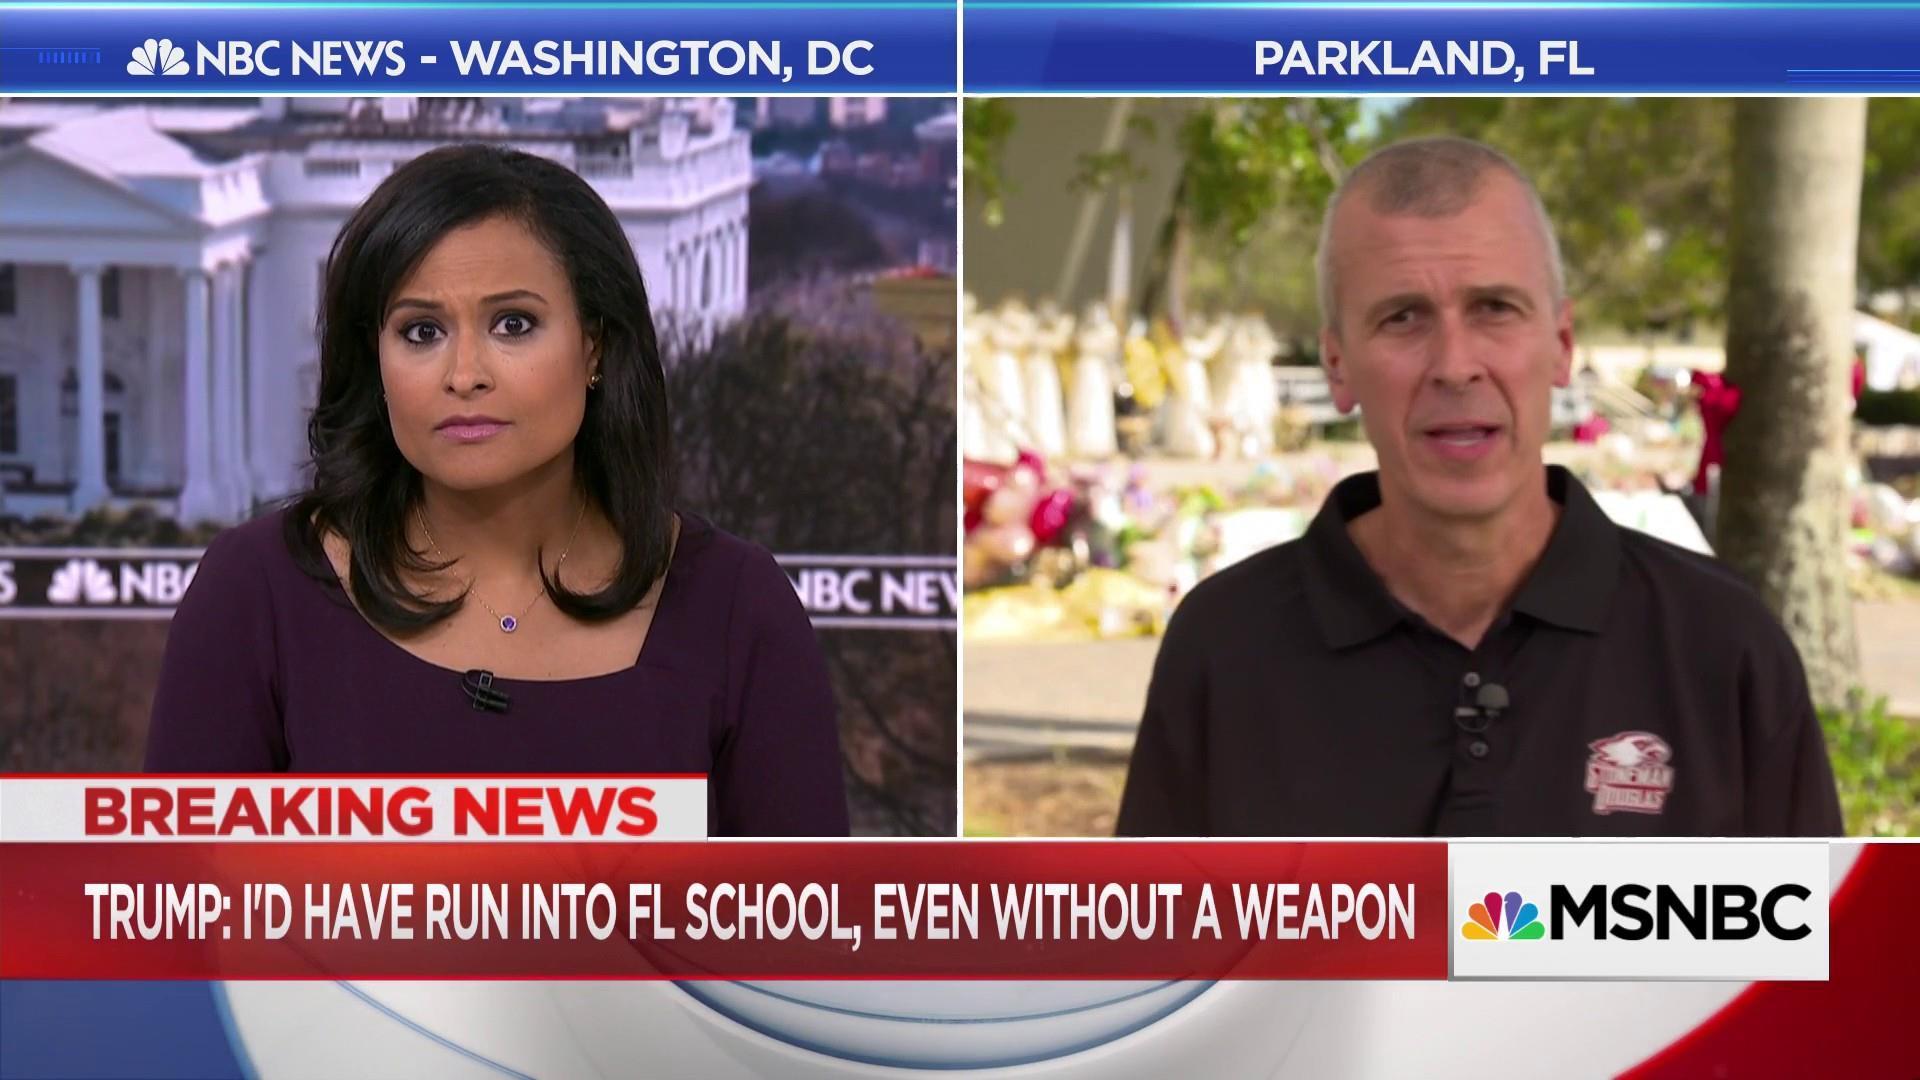 Parkland teacher responds to Trump's idea